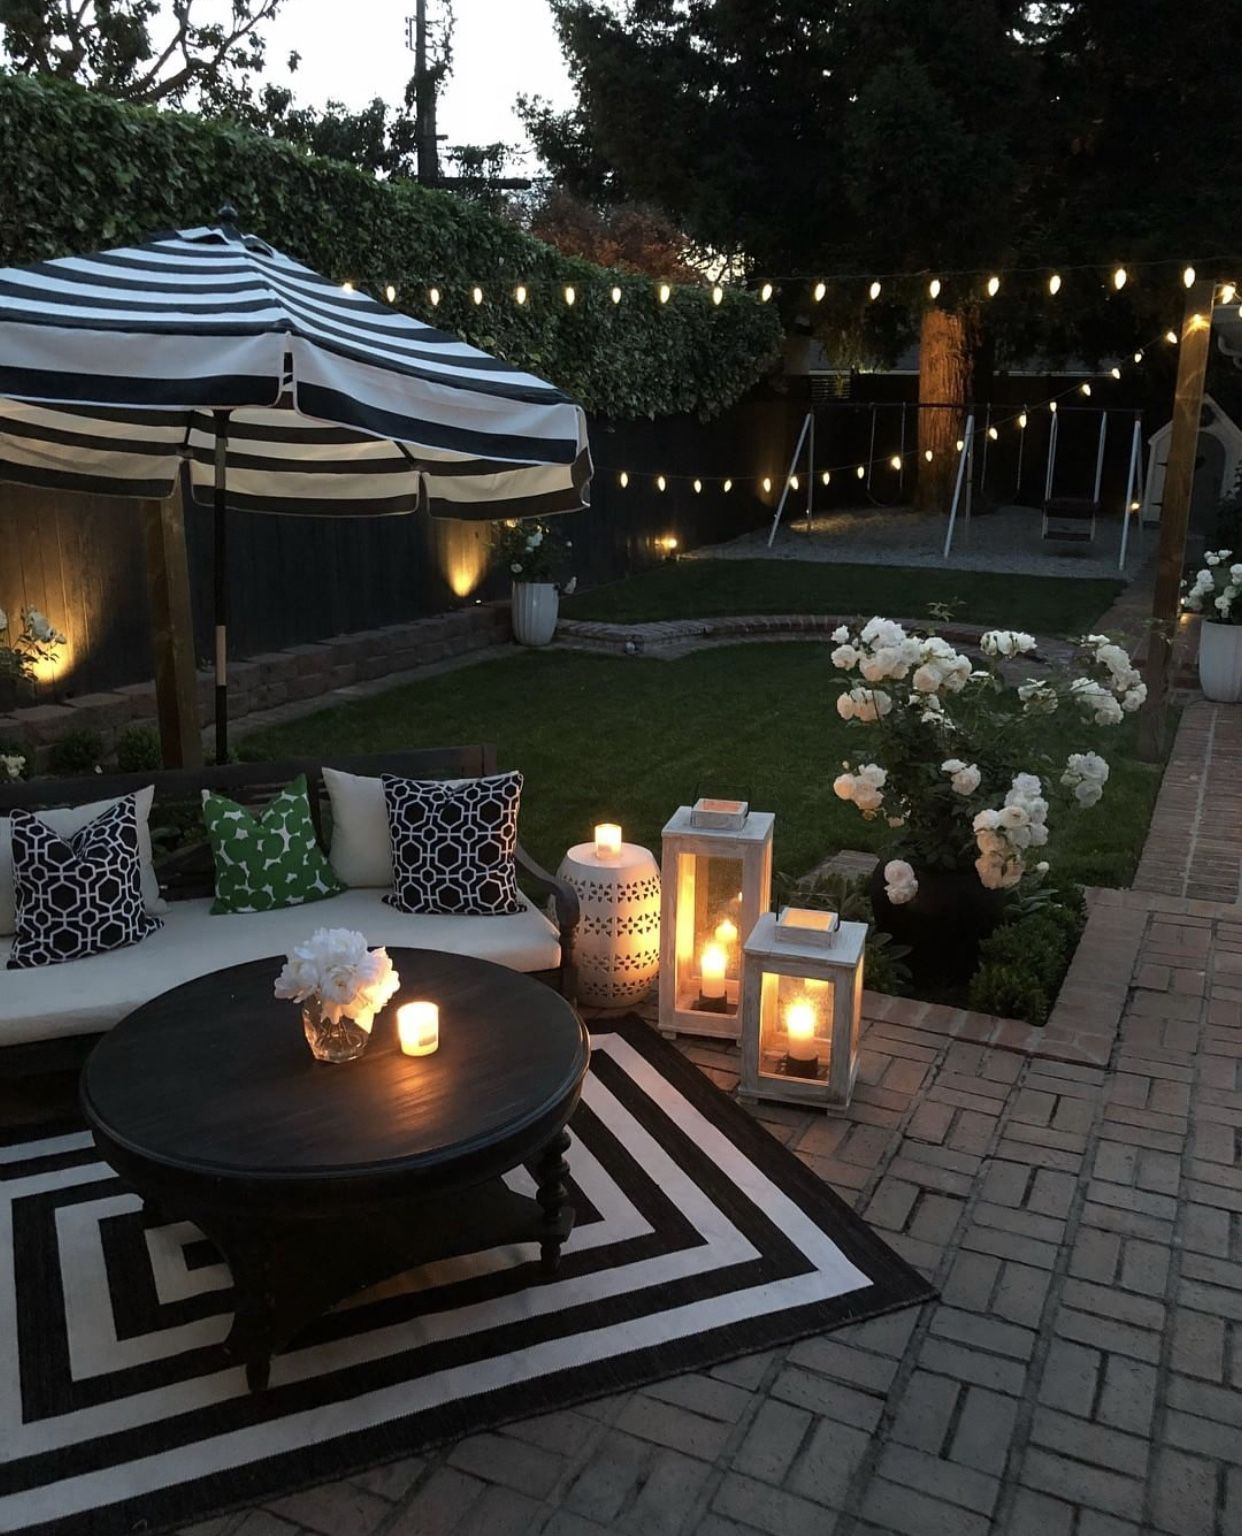 60  small backyard landscaping ideas with rocks  u0026 pool on a budget